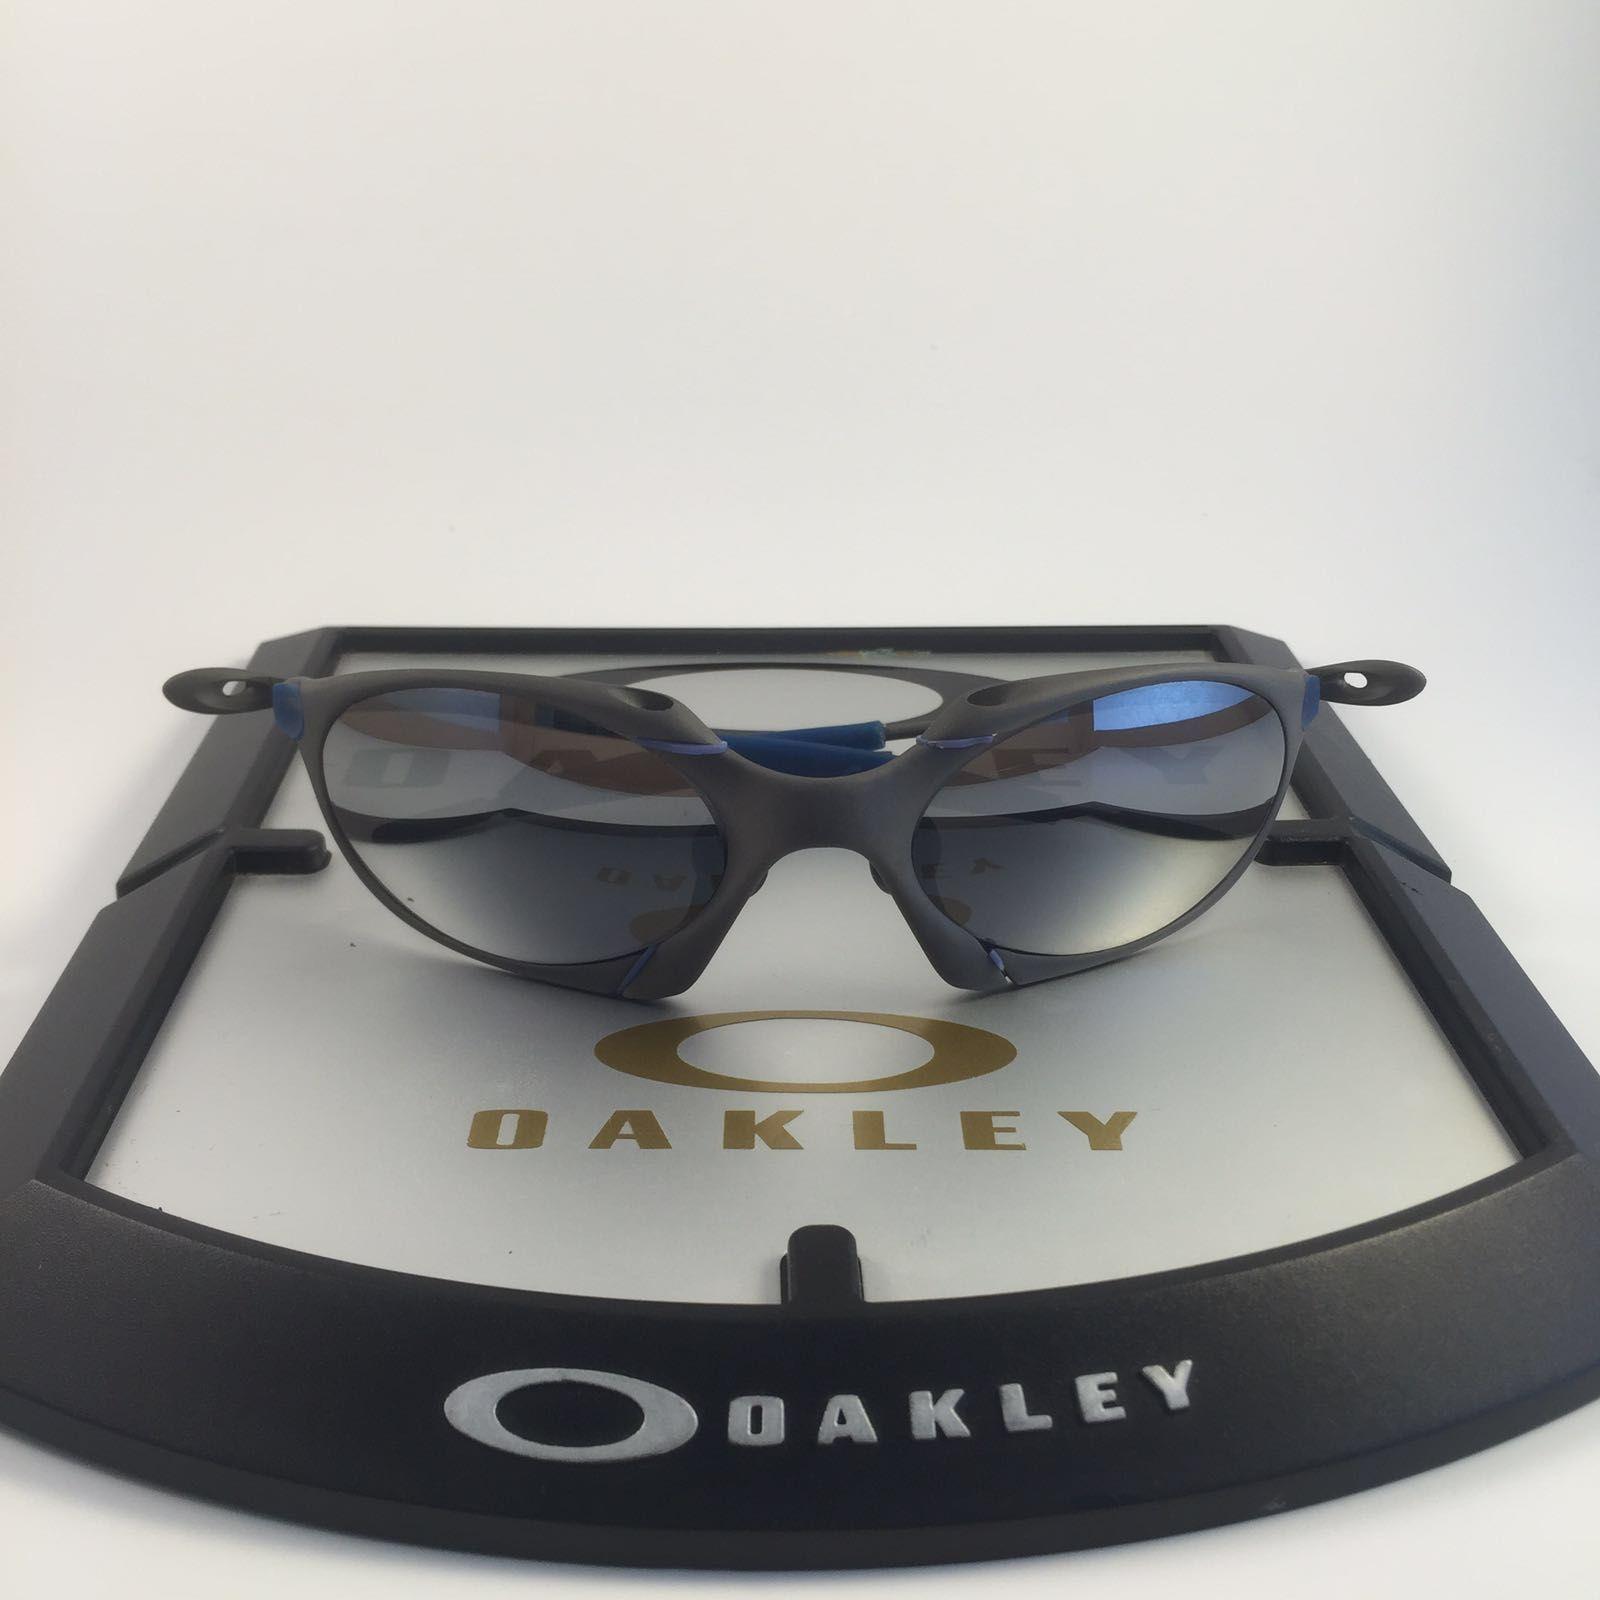 oakley romeo 1 x metal - ccddada9-aa54-4b9b-980e-7563da973cab.jpeg